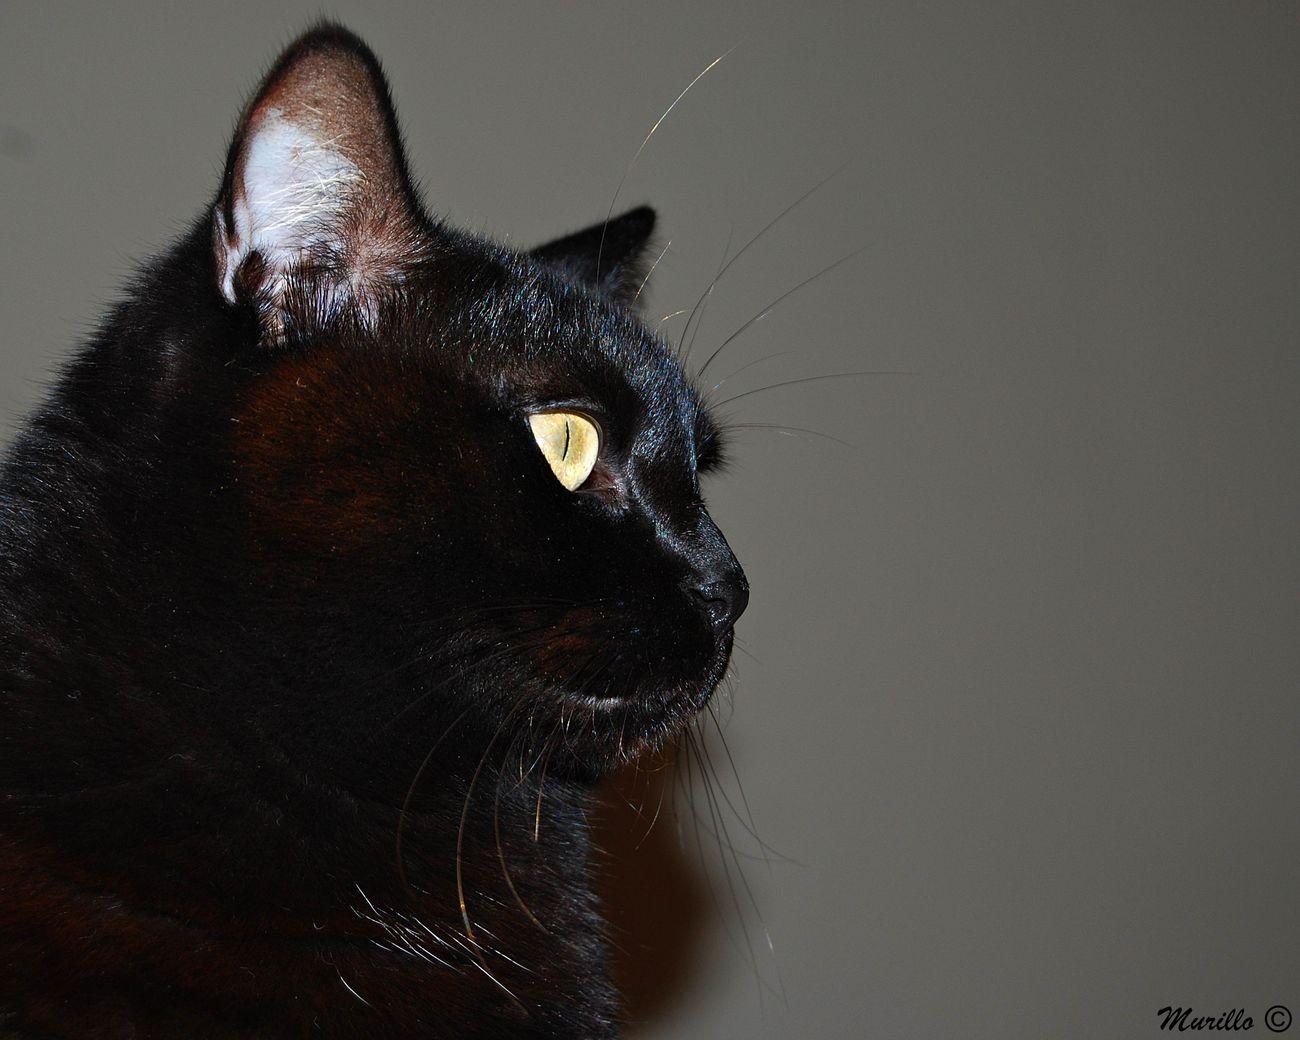 Domestic Cat Feline NikonD60 Nikonphotograhy Catalunya Martorell Animal Photography Nikonespaña Cat Cats Cat♡ Gat Gato Gatos 😍 Cats Of EyeEm Gatos Felinos Felino BLackCat Blackcats Blackcatsofinstagram GatoNegro Cateyes Animal Themes Catphotography